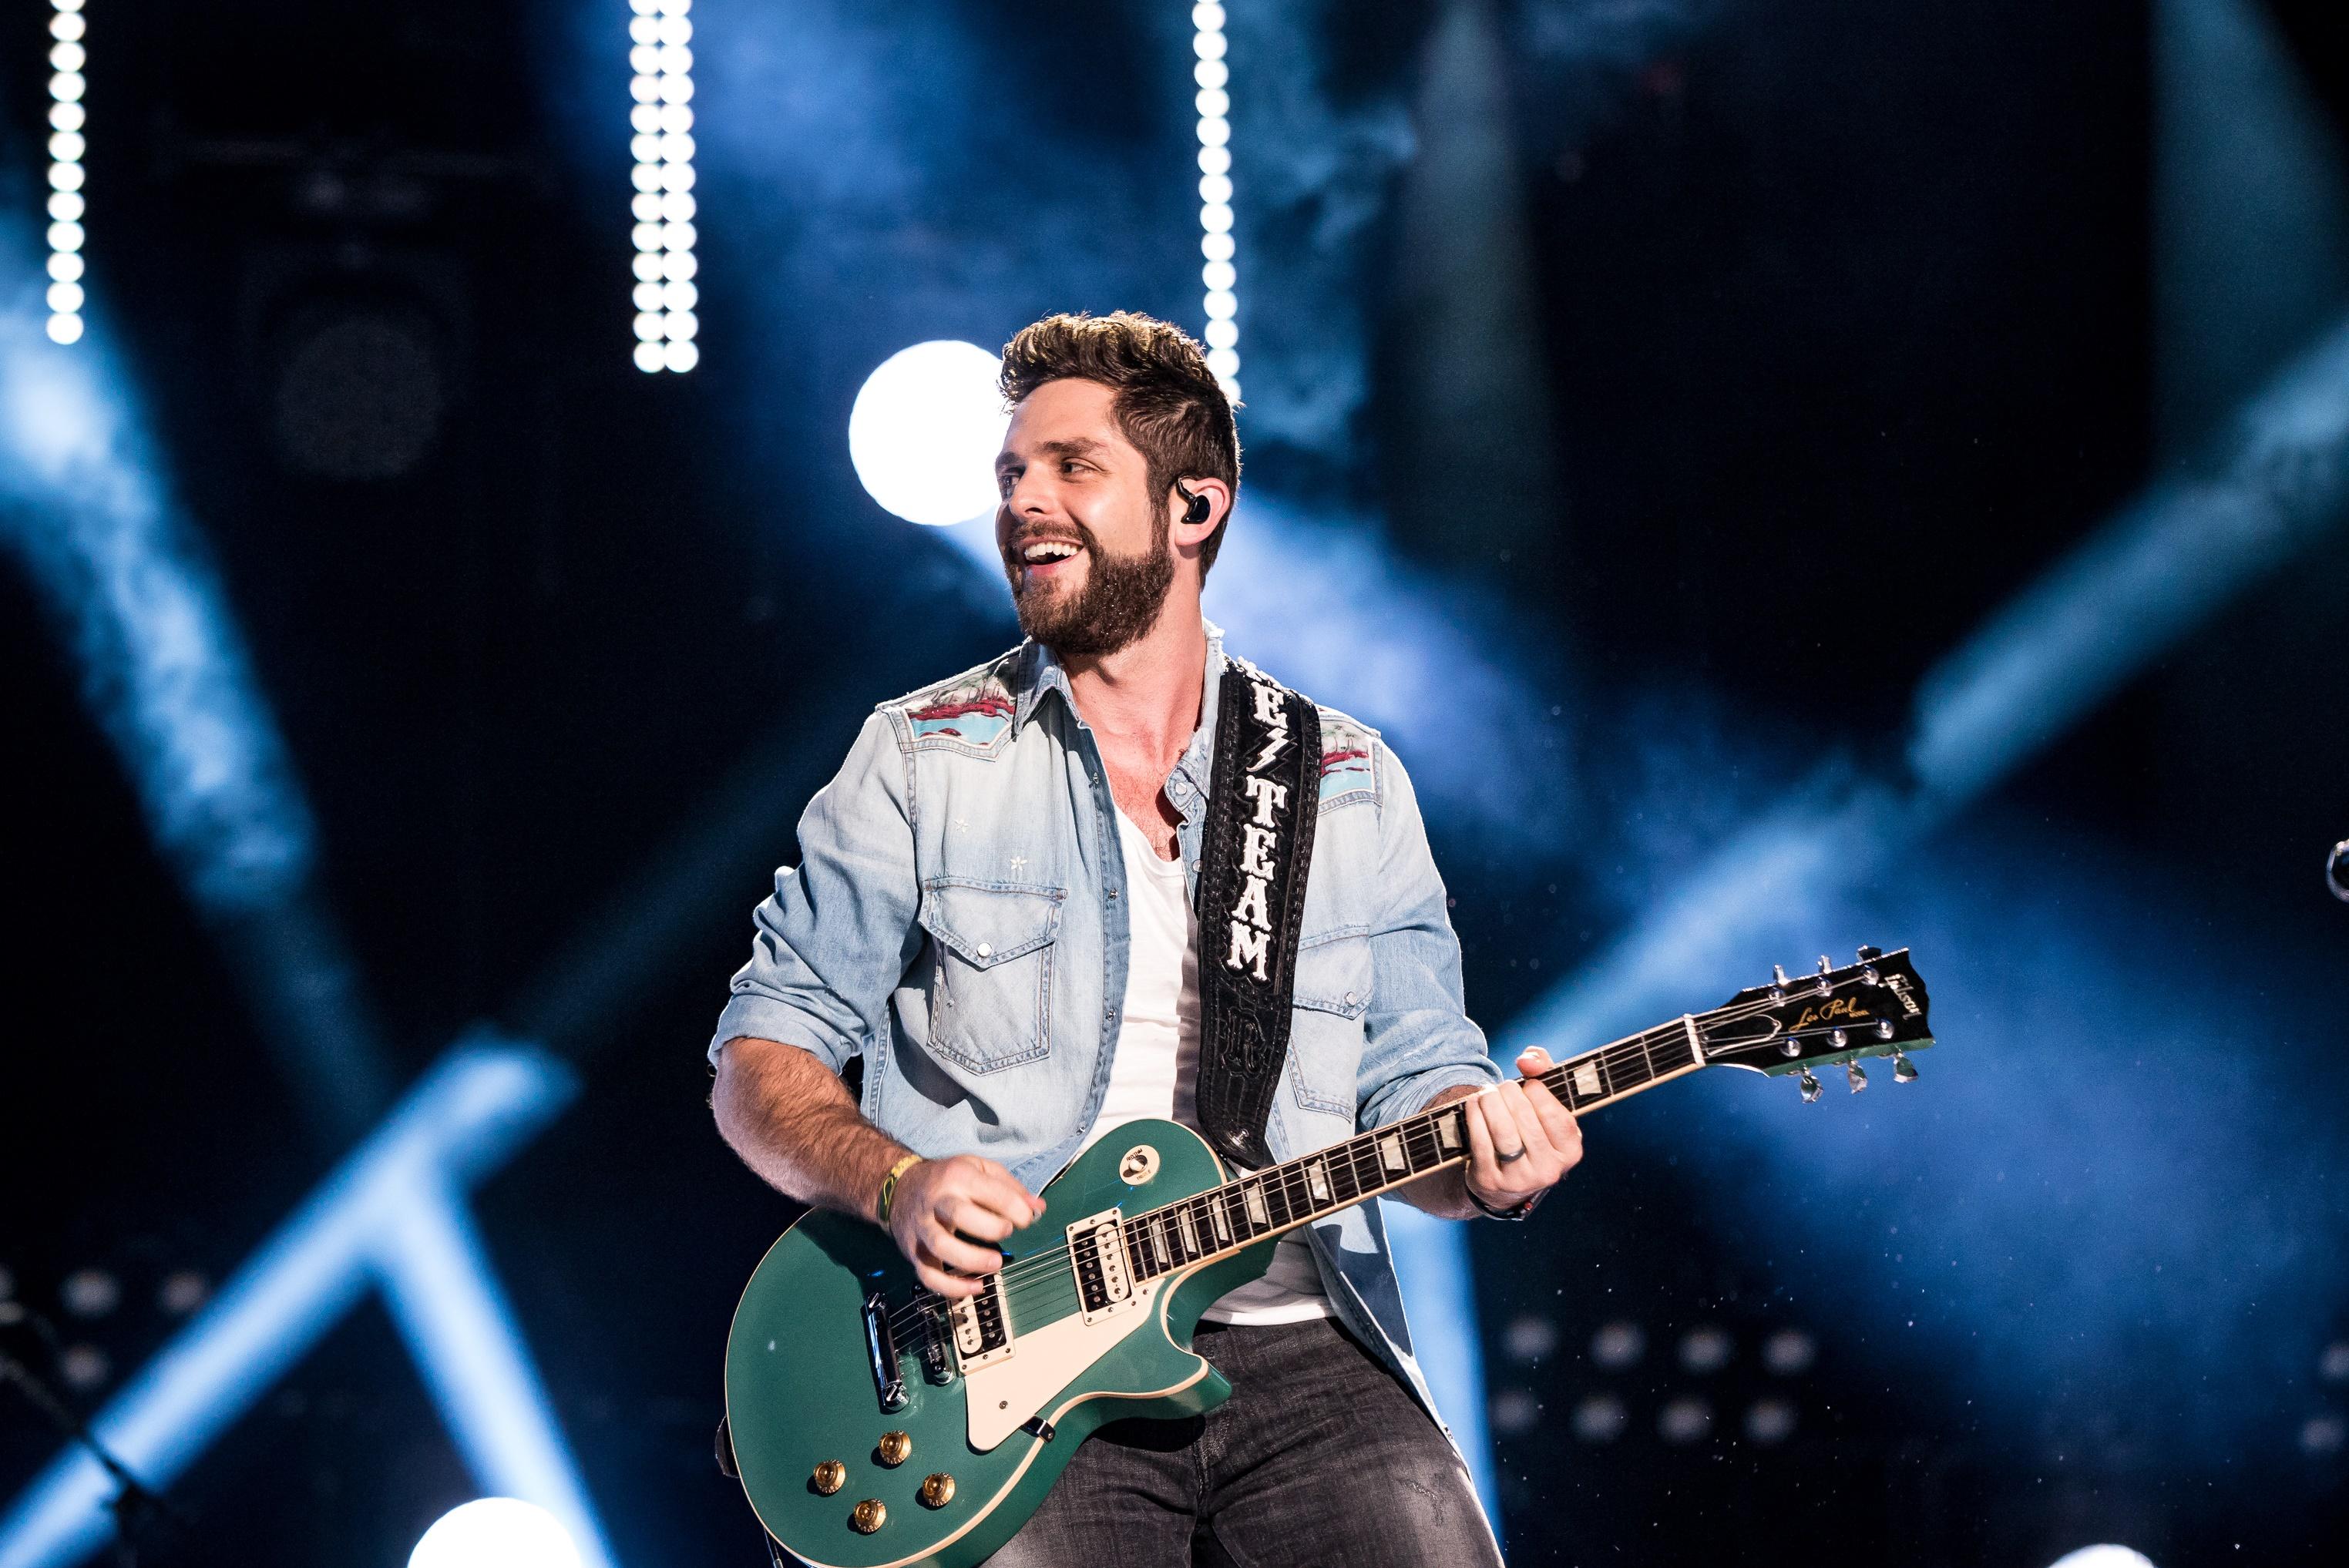 Thomas Rhett Scores 11th No 1 with 'Life Changes,' Announces